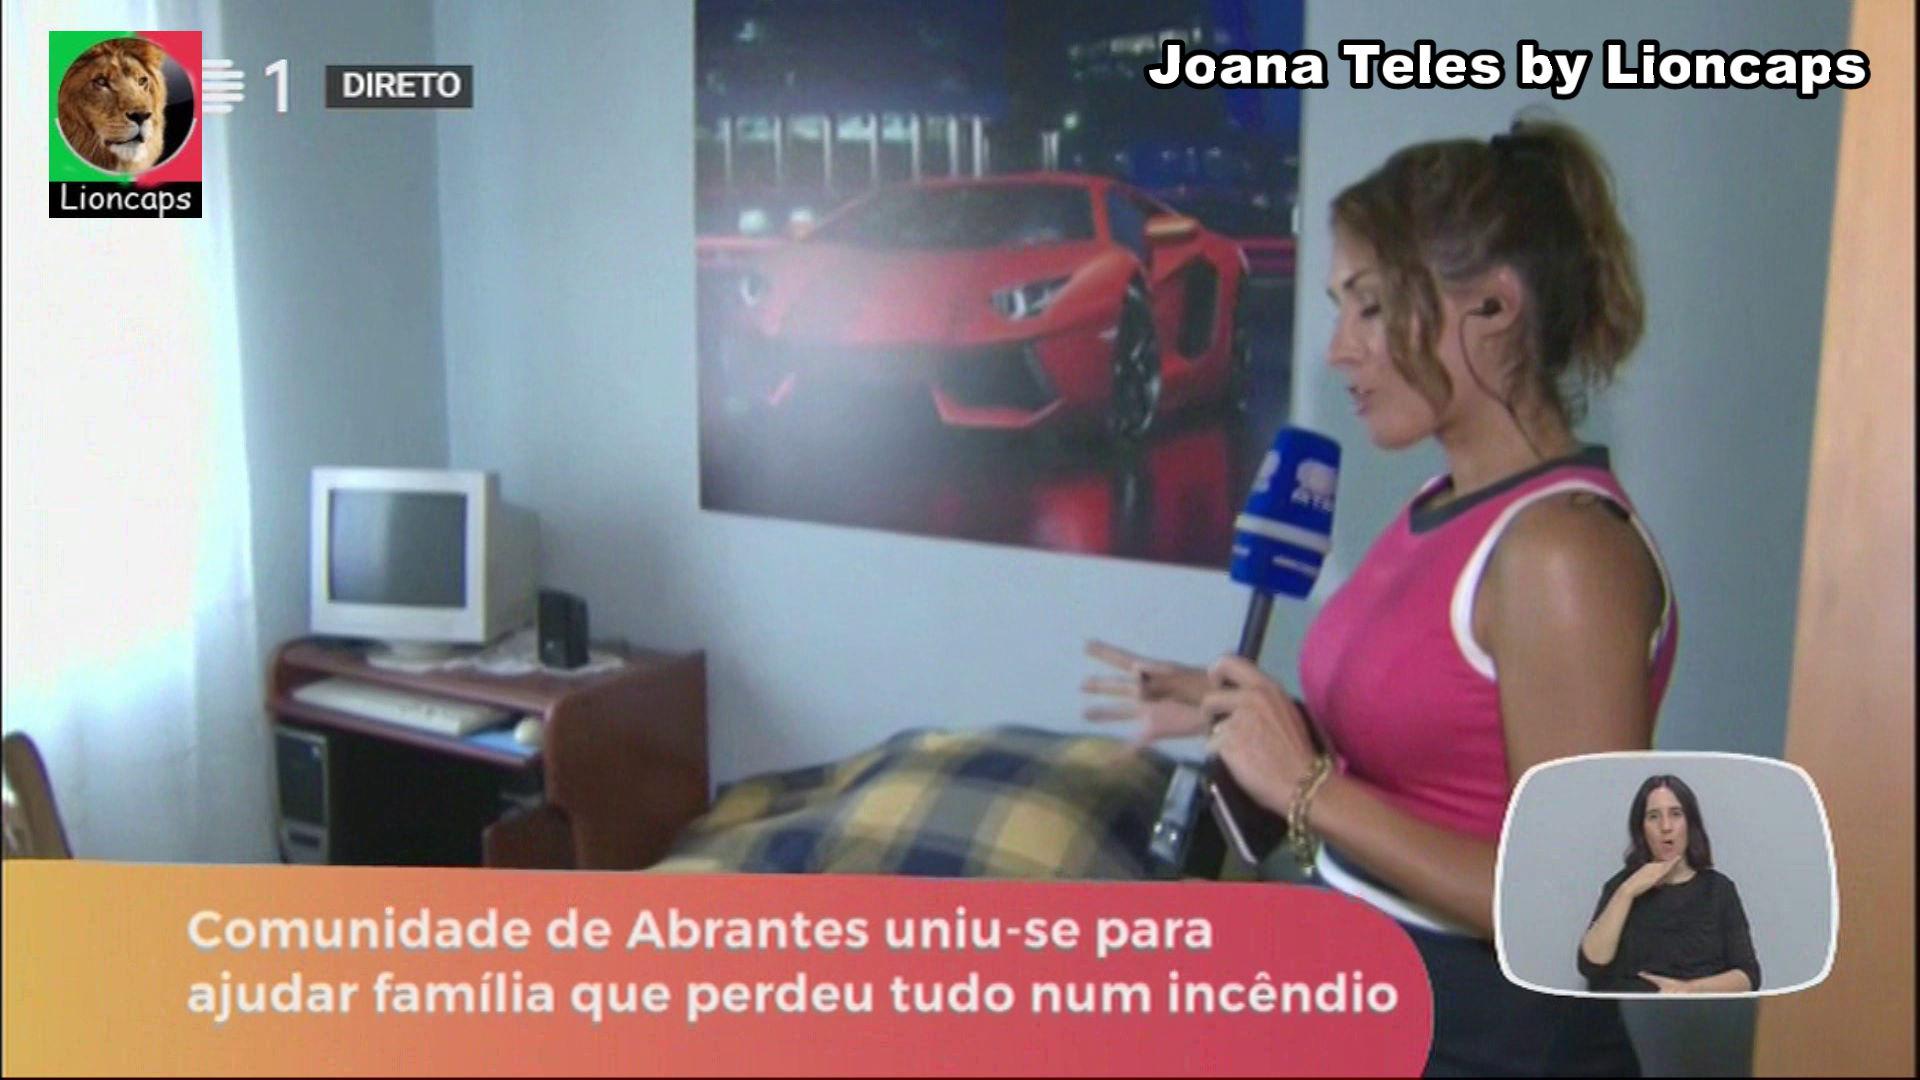 976666352_joana_teles_vs200125_1163_122_403lo.JPG